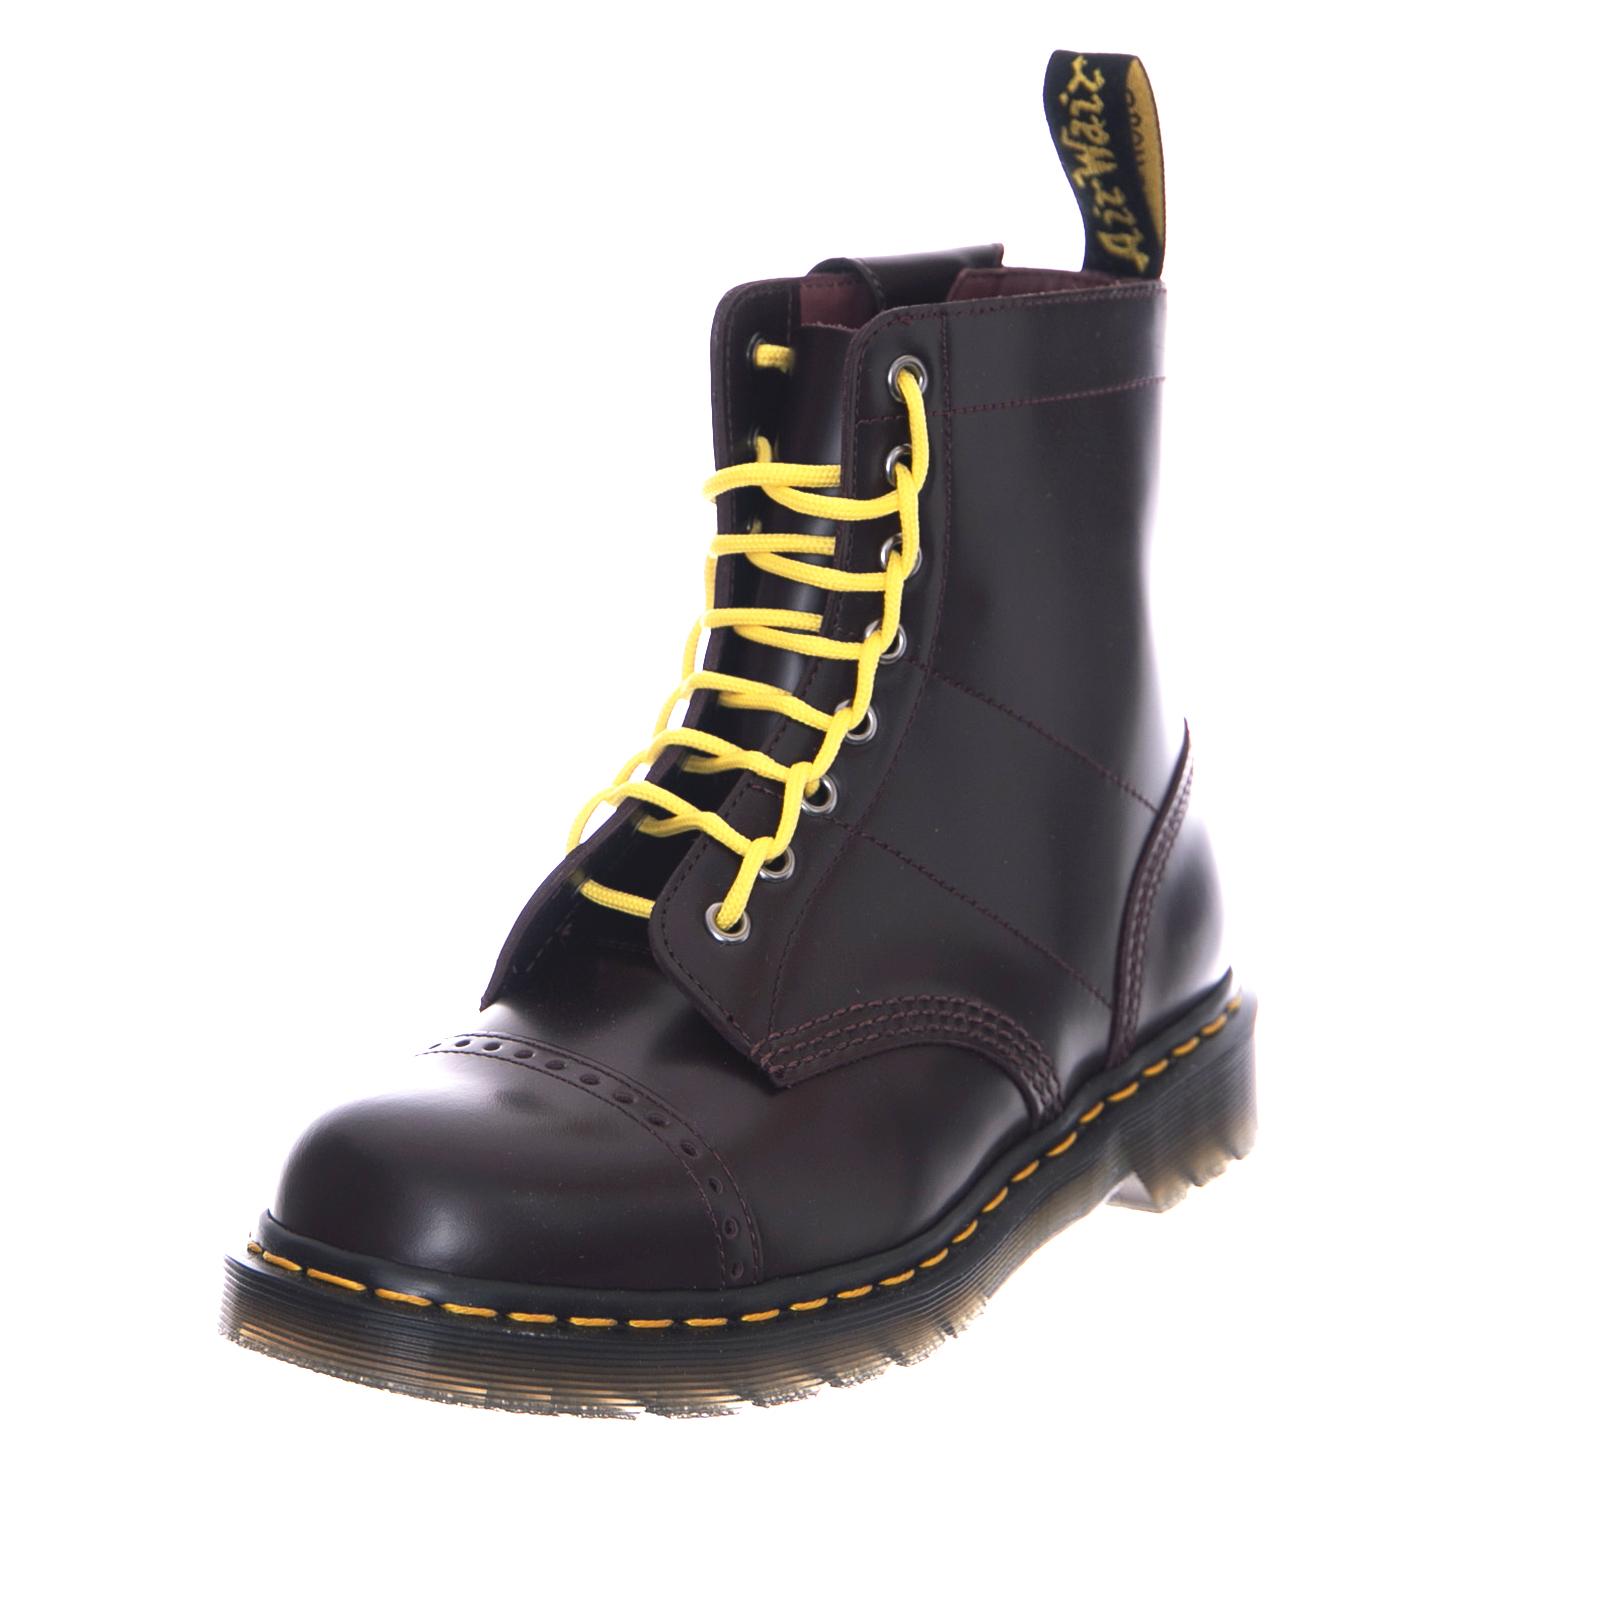 a5968d1d38f24 Dr.Martens Stivali Dr. Martens X Needles 1460 - Black Smooth - Yellow Laces